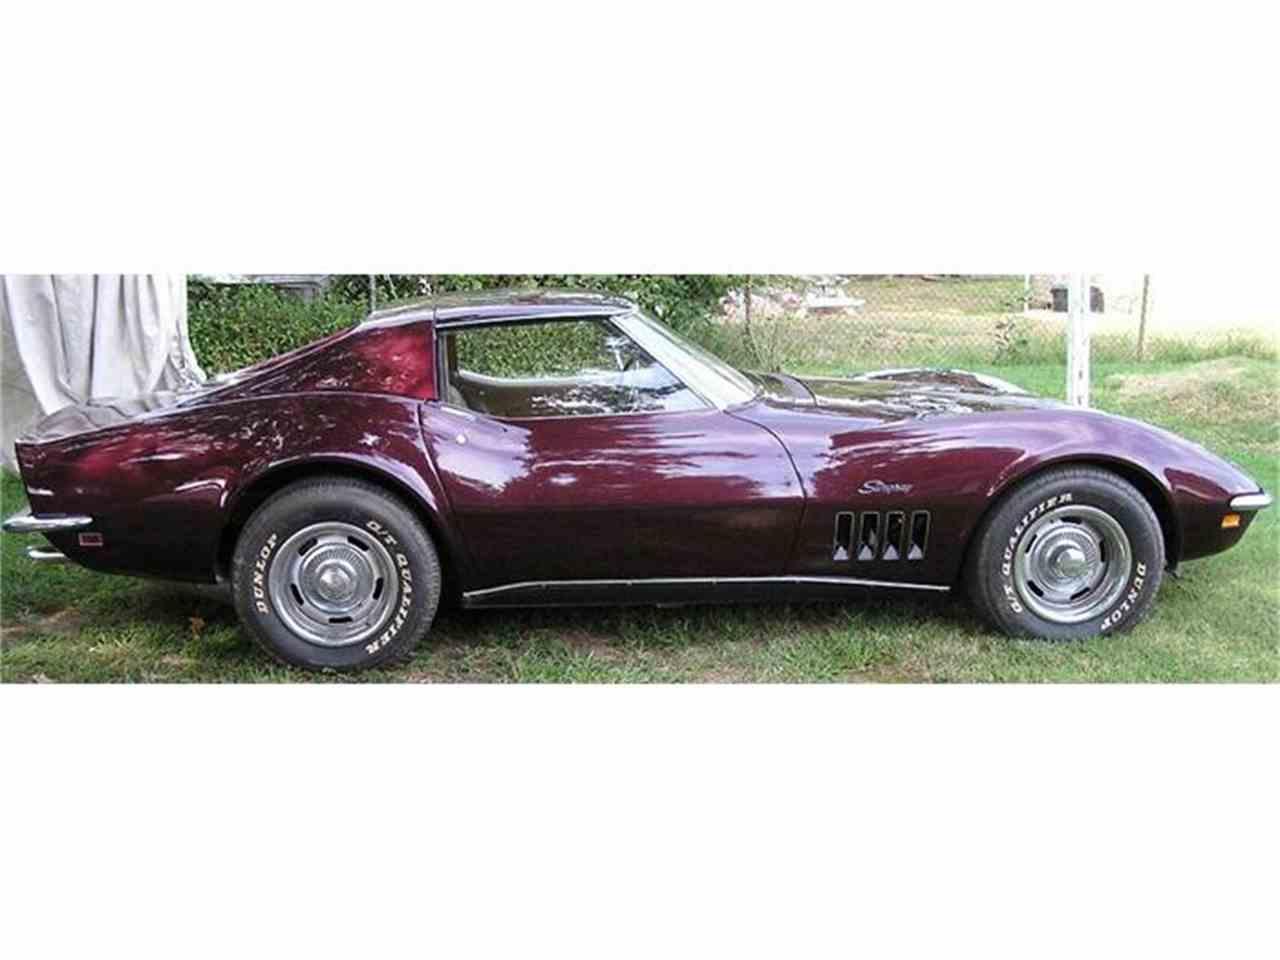 Large Picture of Classic 1969 Corvette located in richmond Virginia - $19,000.00 - 5MKF